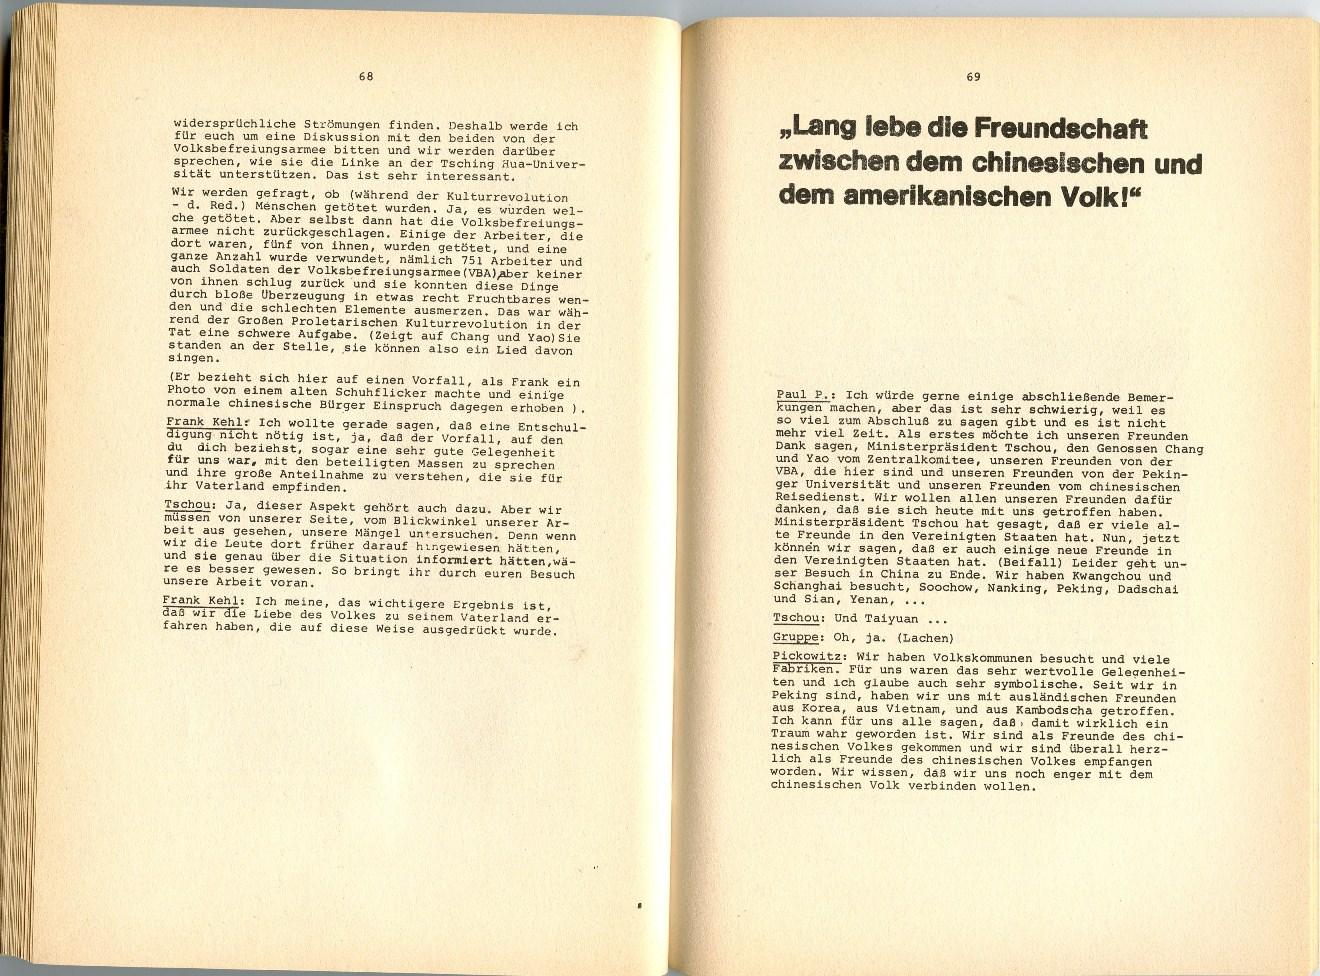 ZB_VRChina_Bollwerk_1971_36